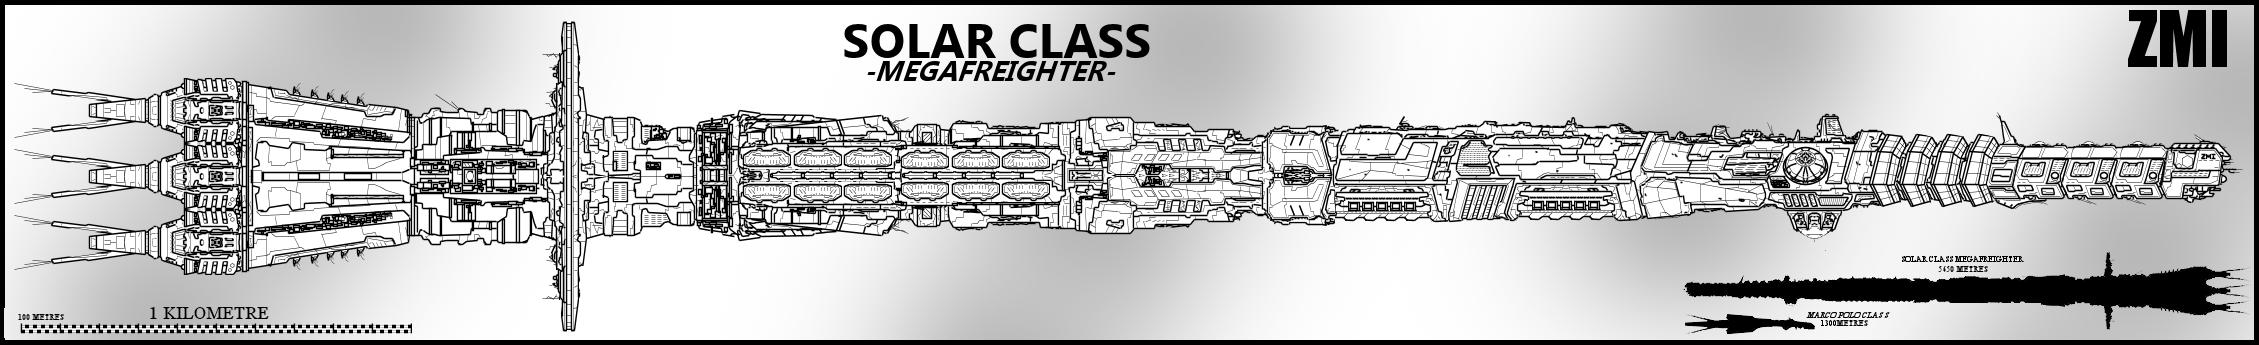 Solar Class Megafrieghter by Evilonavich